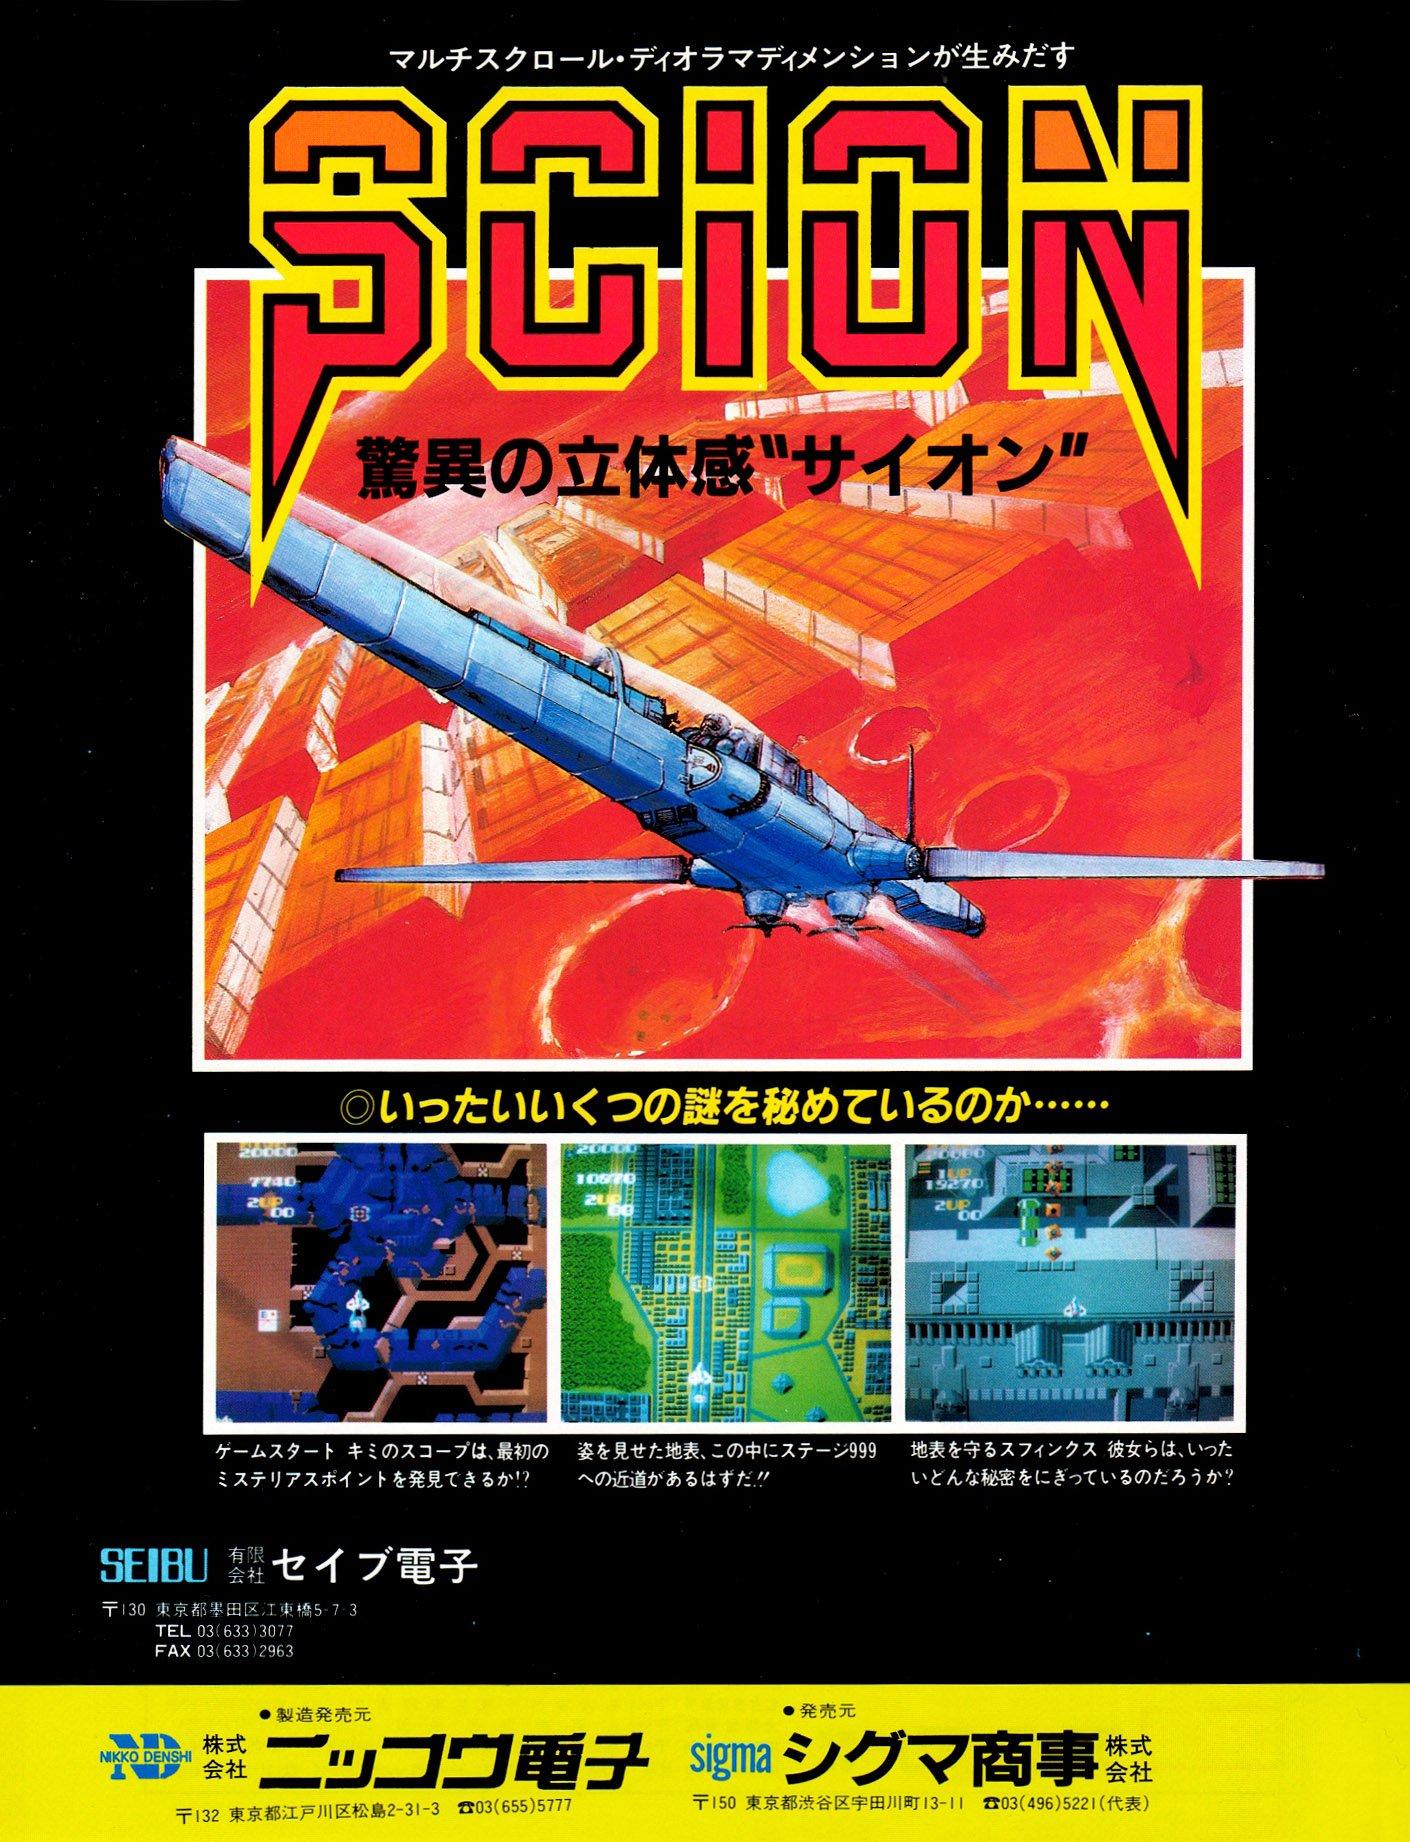 Scion (Japan)